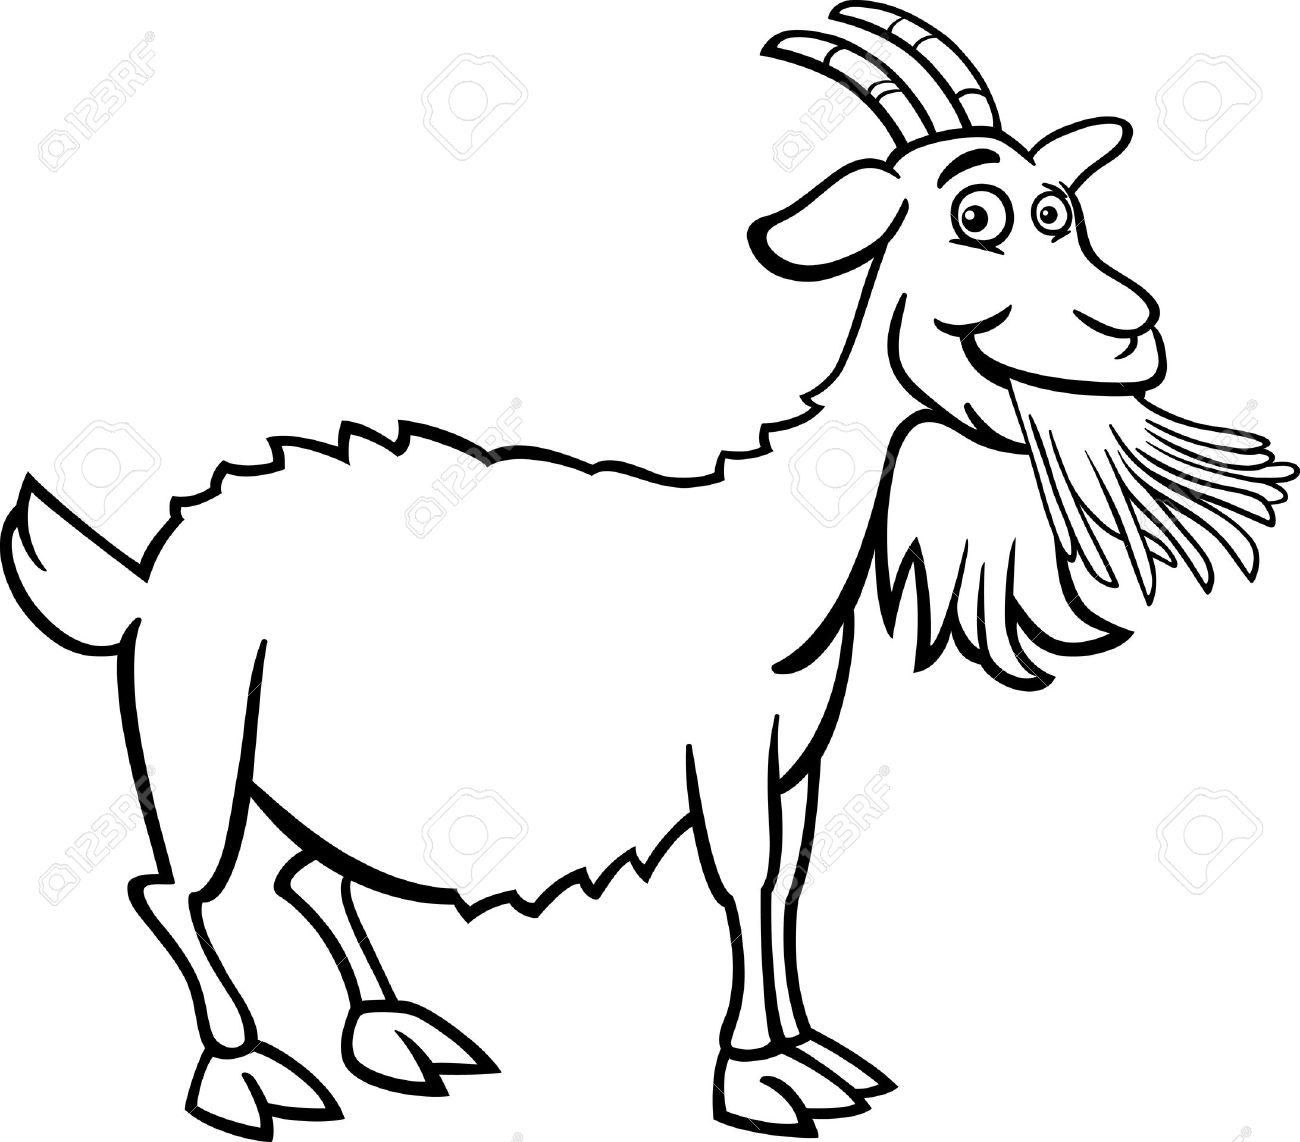 1300x1142 Black And White Cartoon Illustration Of Funny Goat Farm Animal